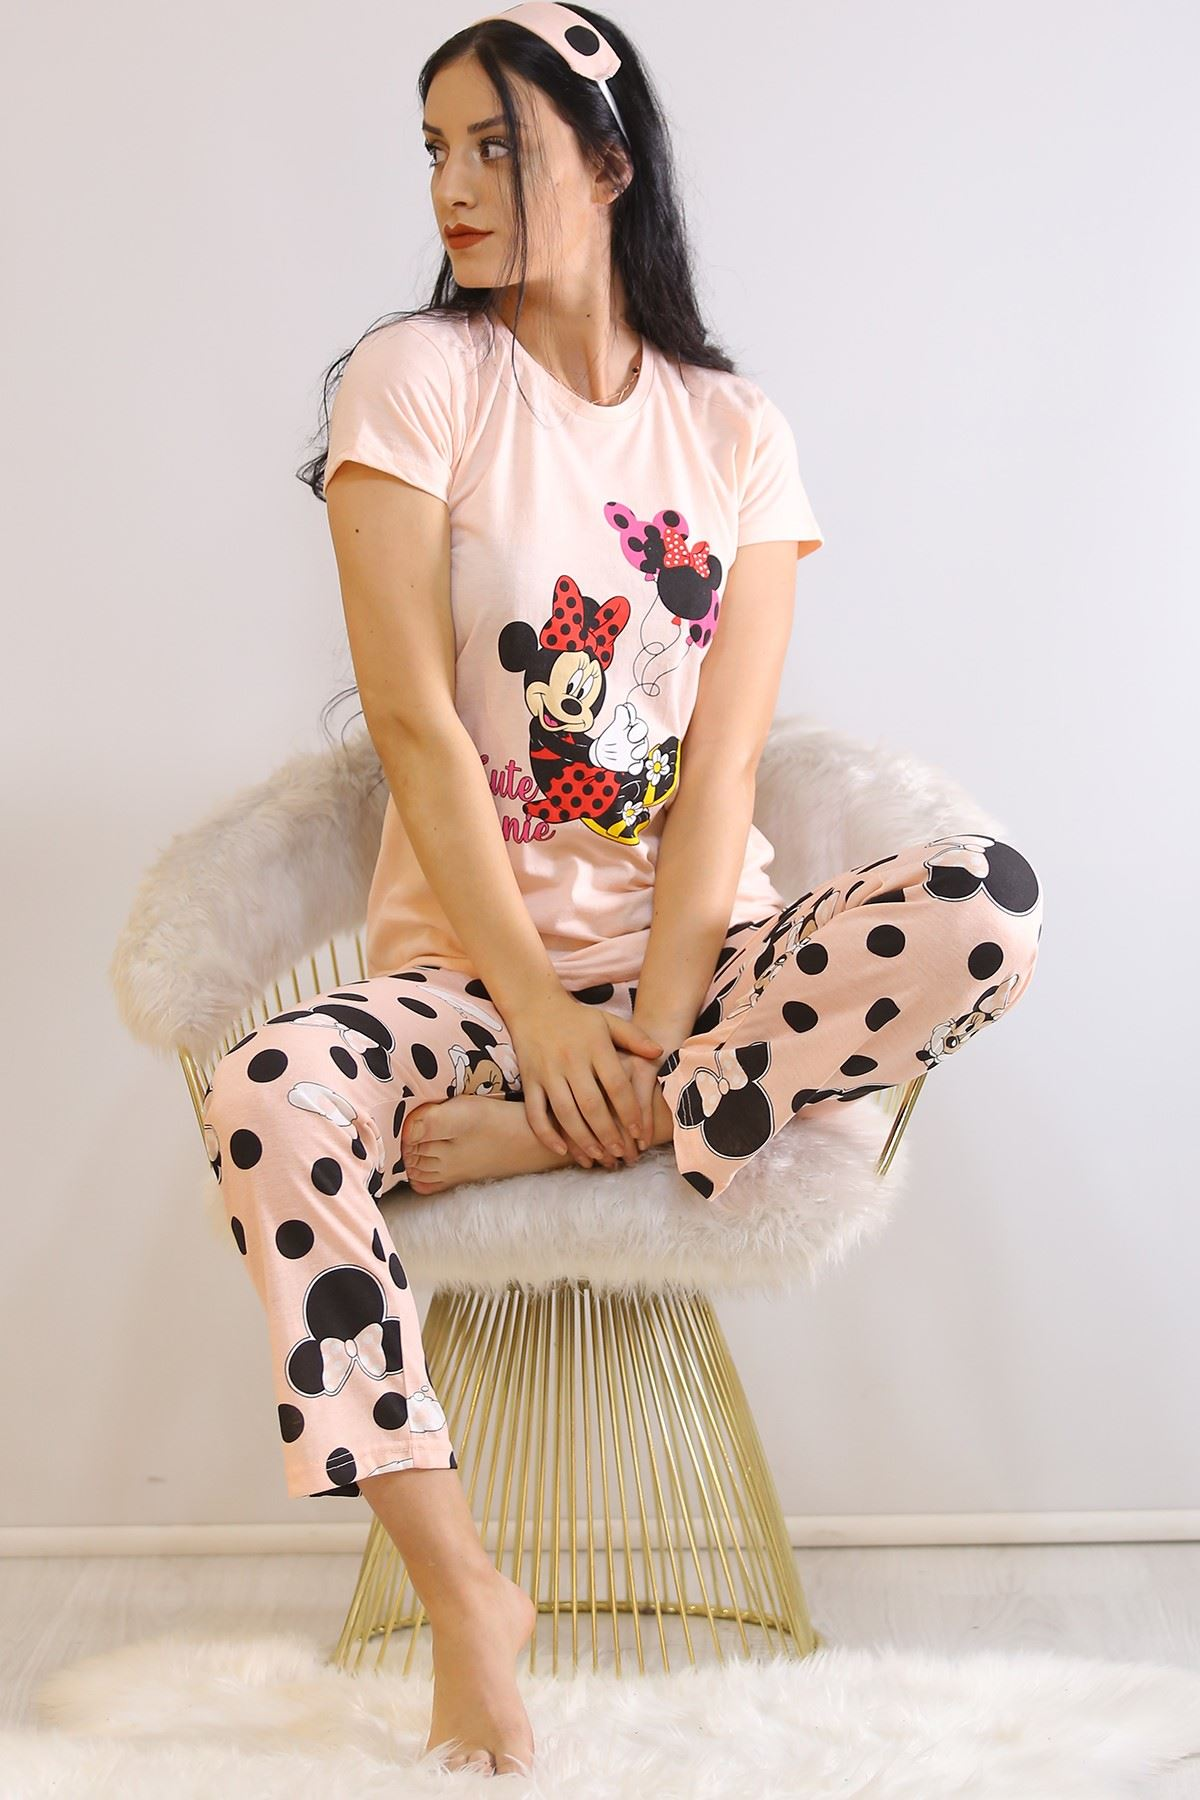 Baskılı Pijama Takımı Pudra - 21271.1059.